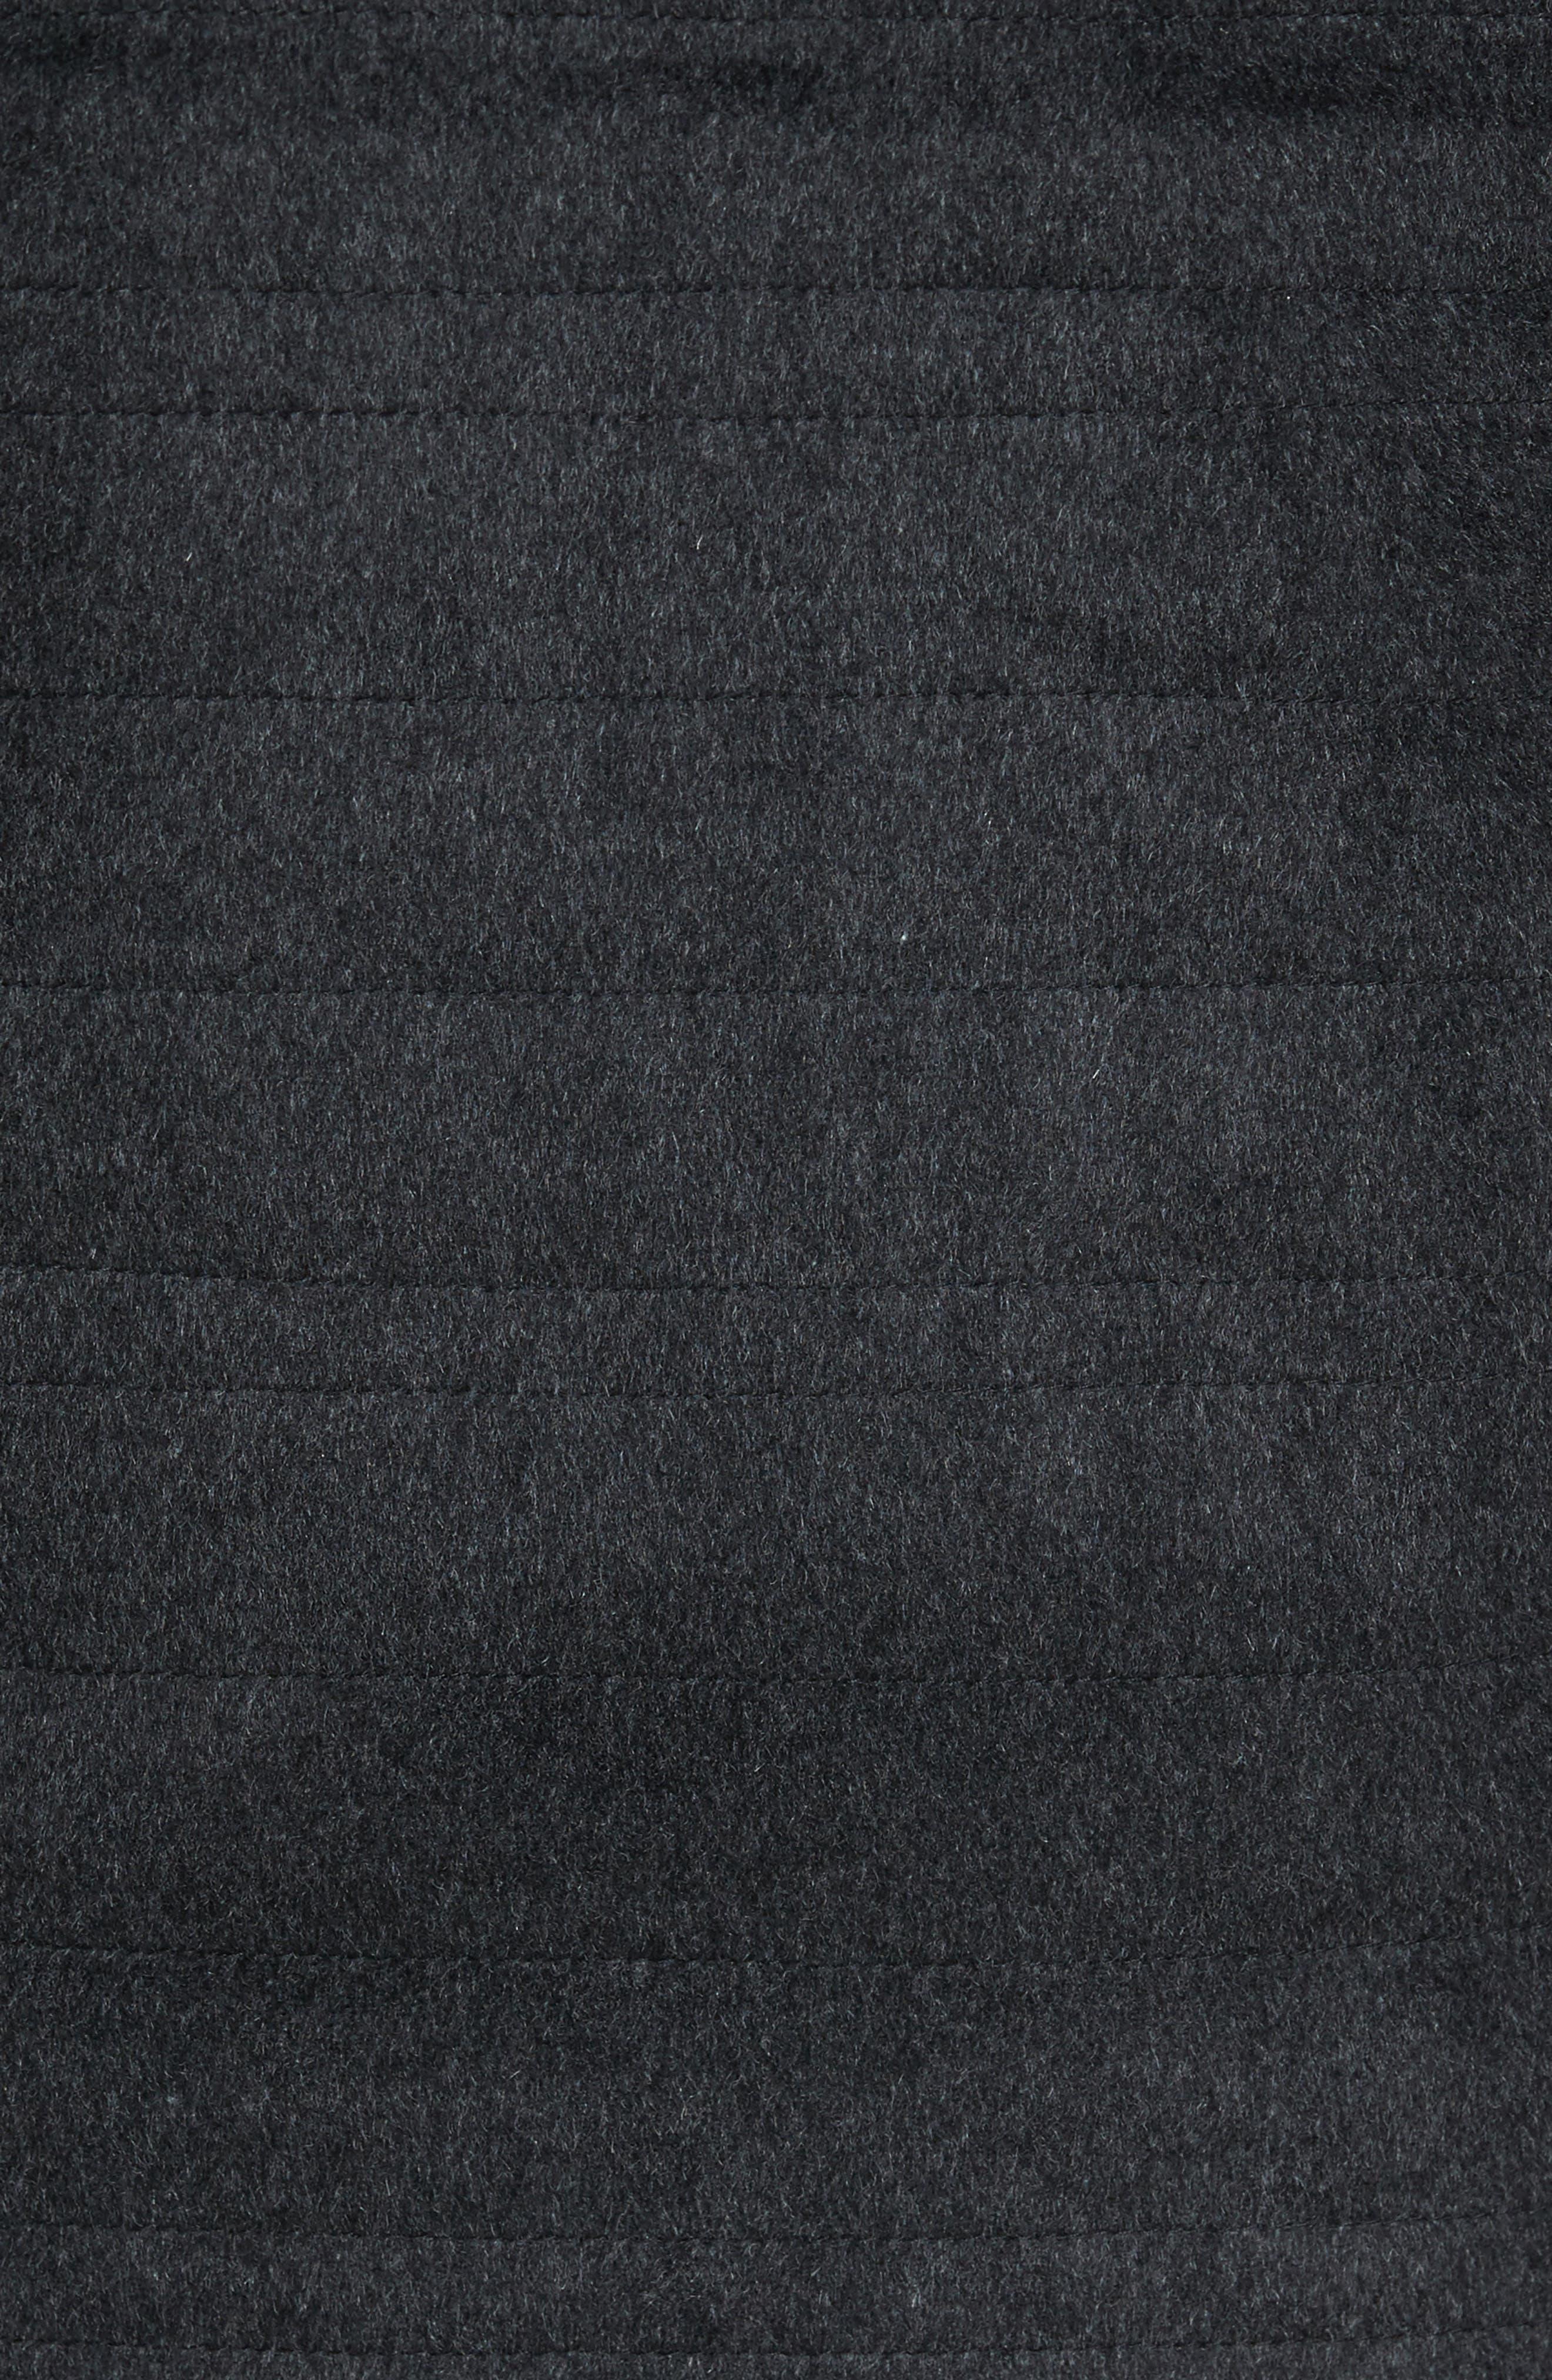 Michael Slim Fit Quilted Shirt Jacket,                             Alternate thumbnail 5, color,                             Dark Char Melange